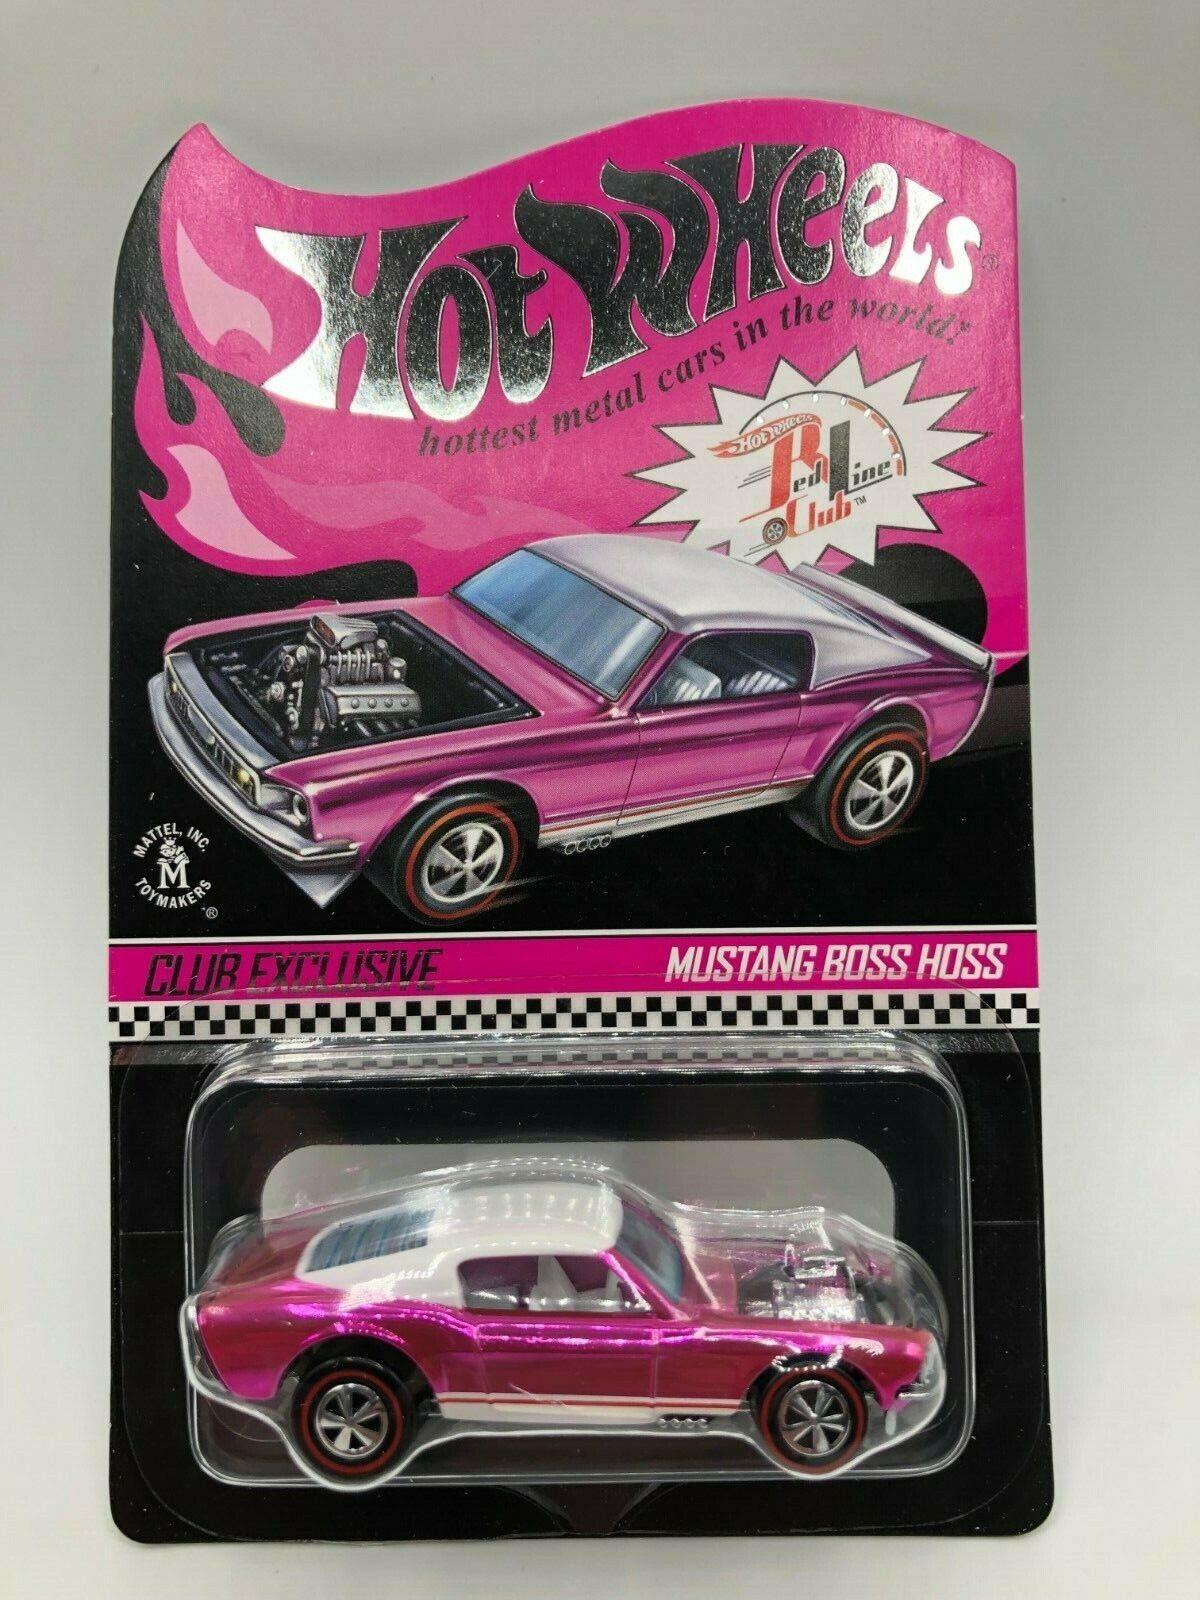 Hot Wheels Club Exclusive RLC Mustang Boss Hoss